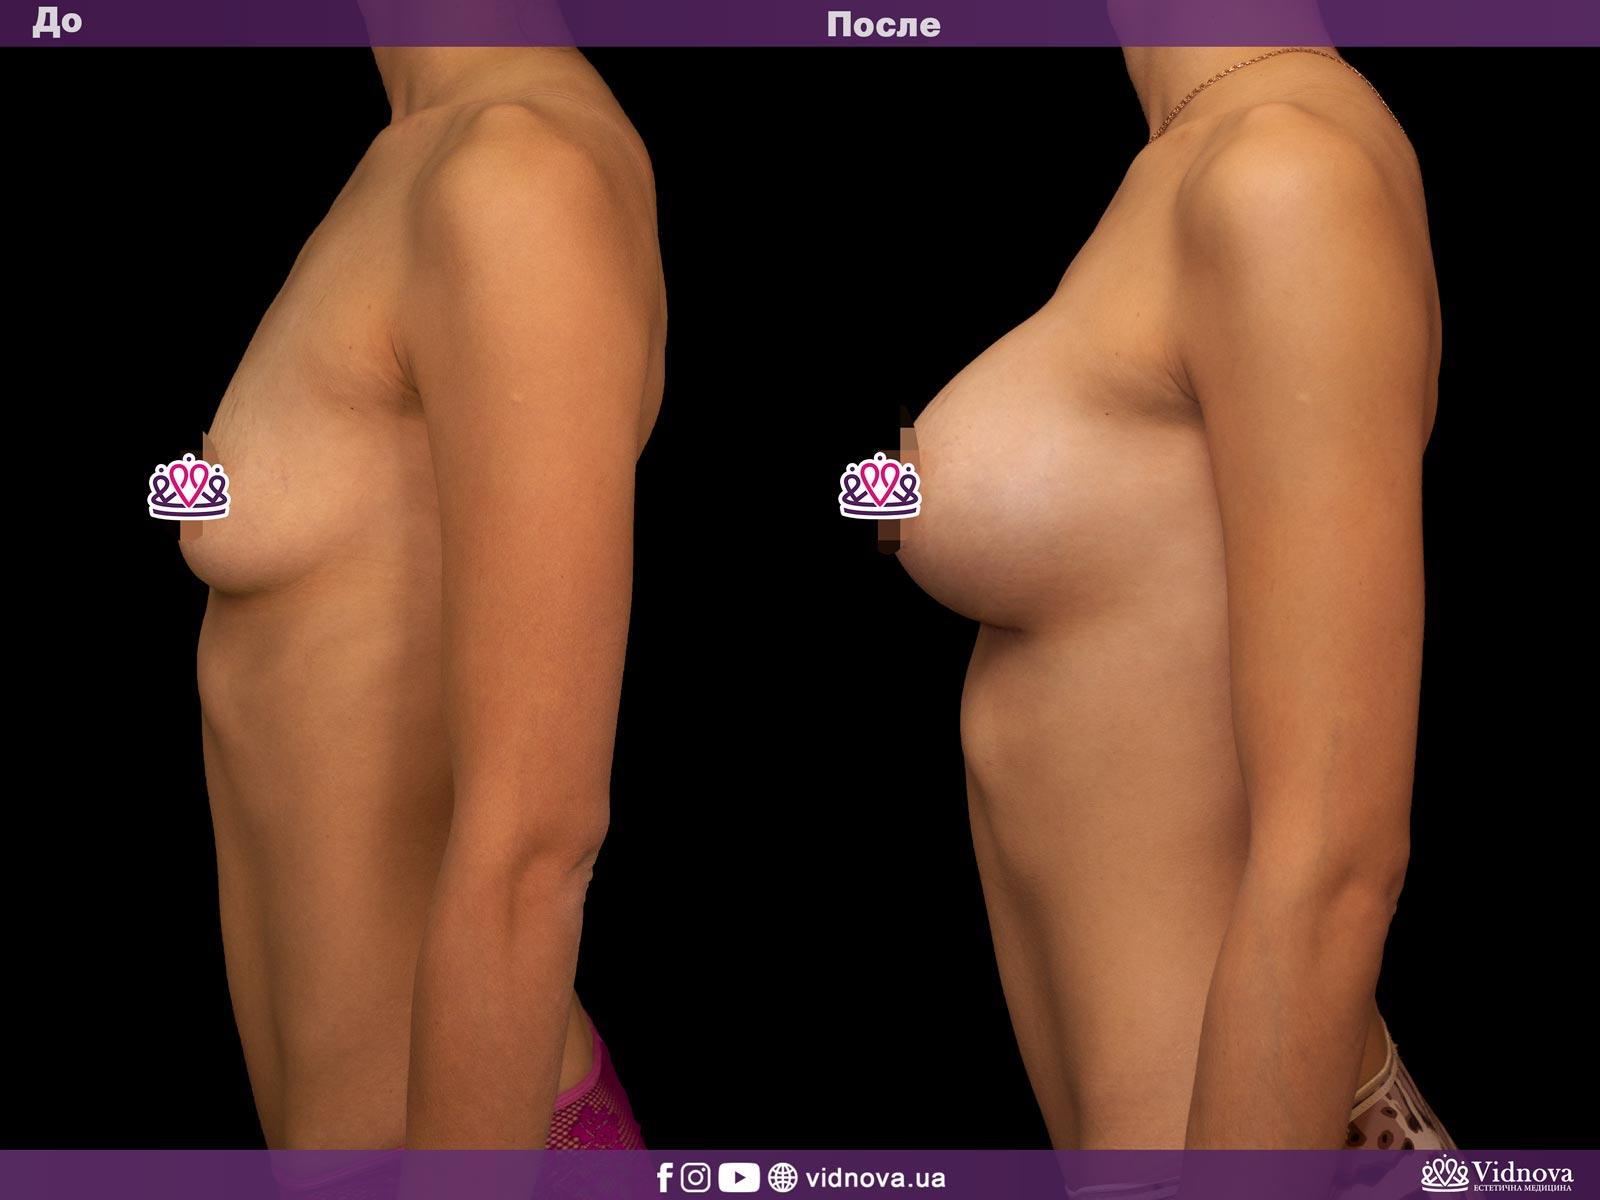 Увеличение груди: Фото ДО и ПОСЛЕ - Пример №19-3 - Клиника Vidnova